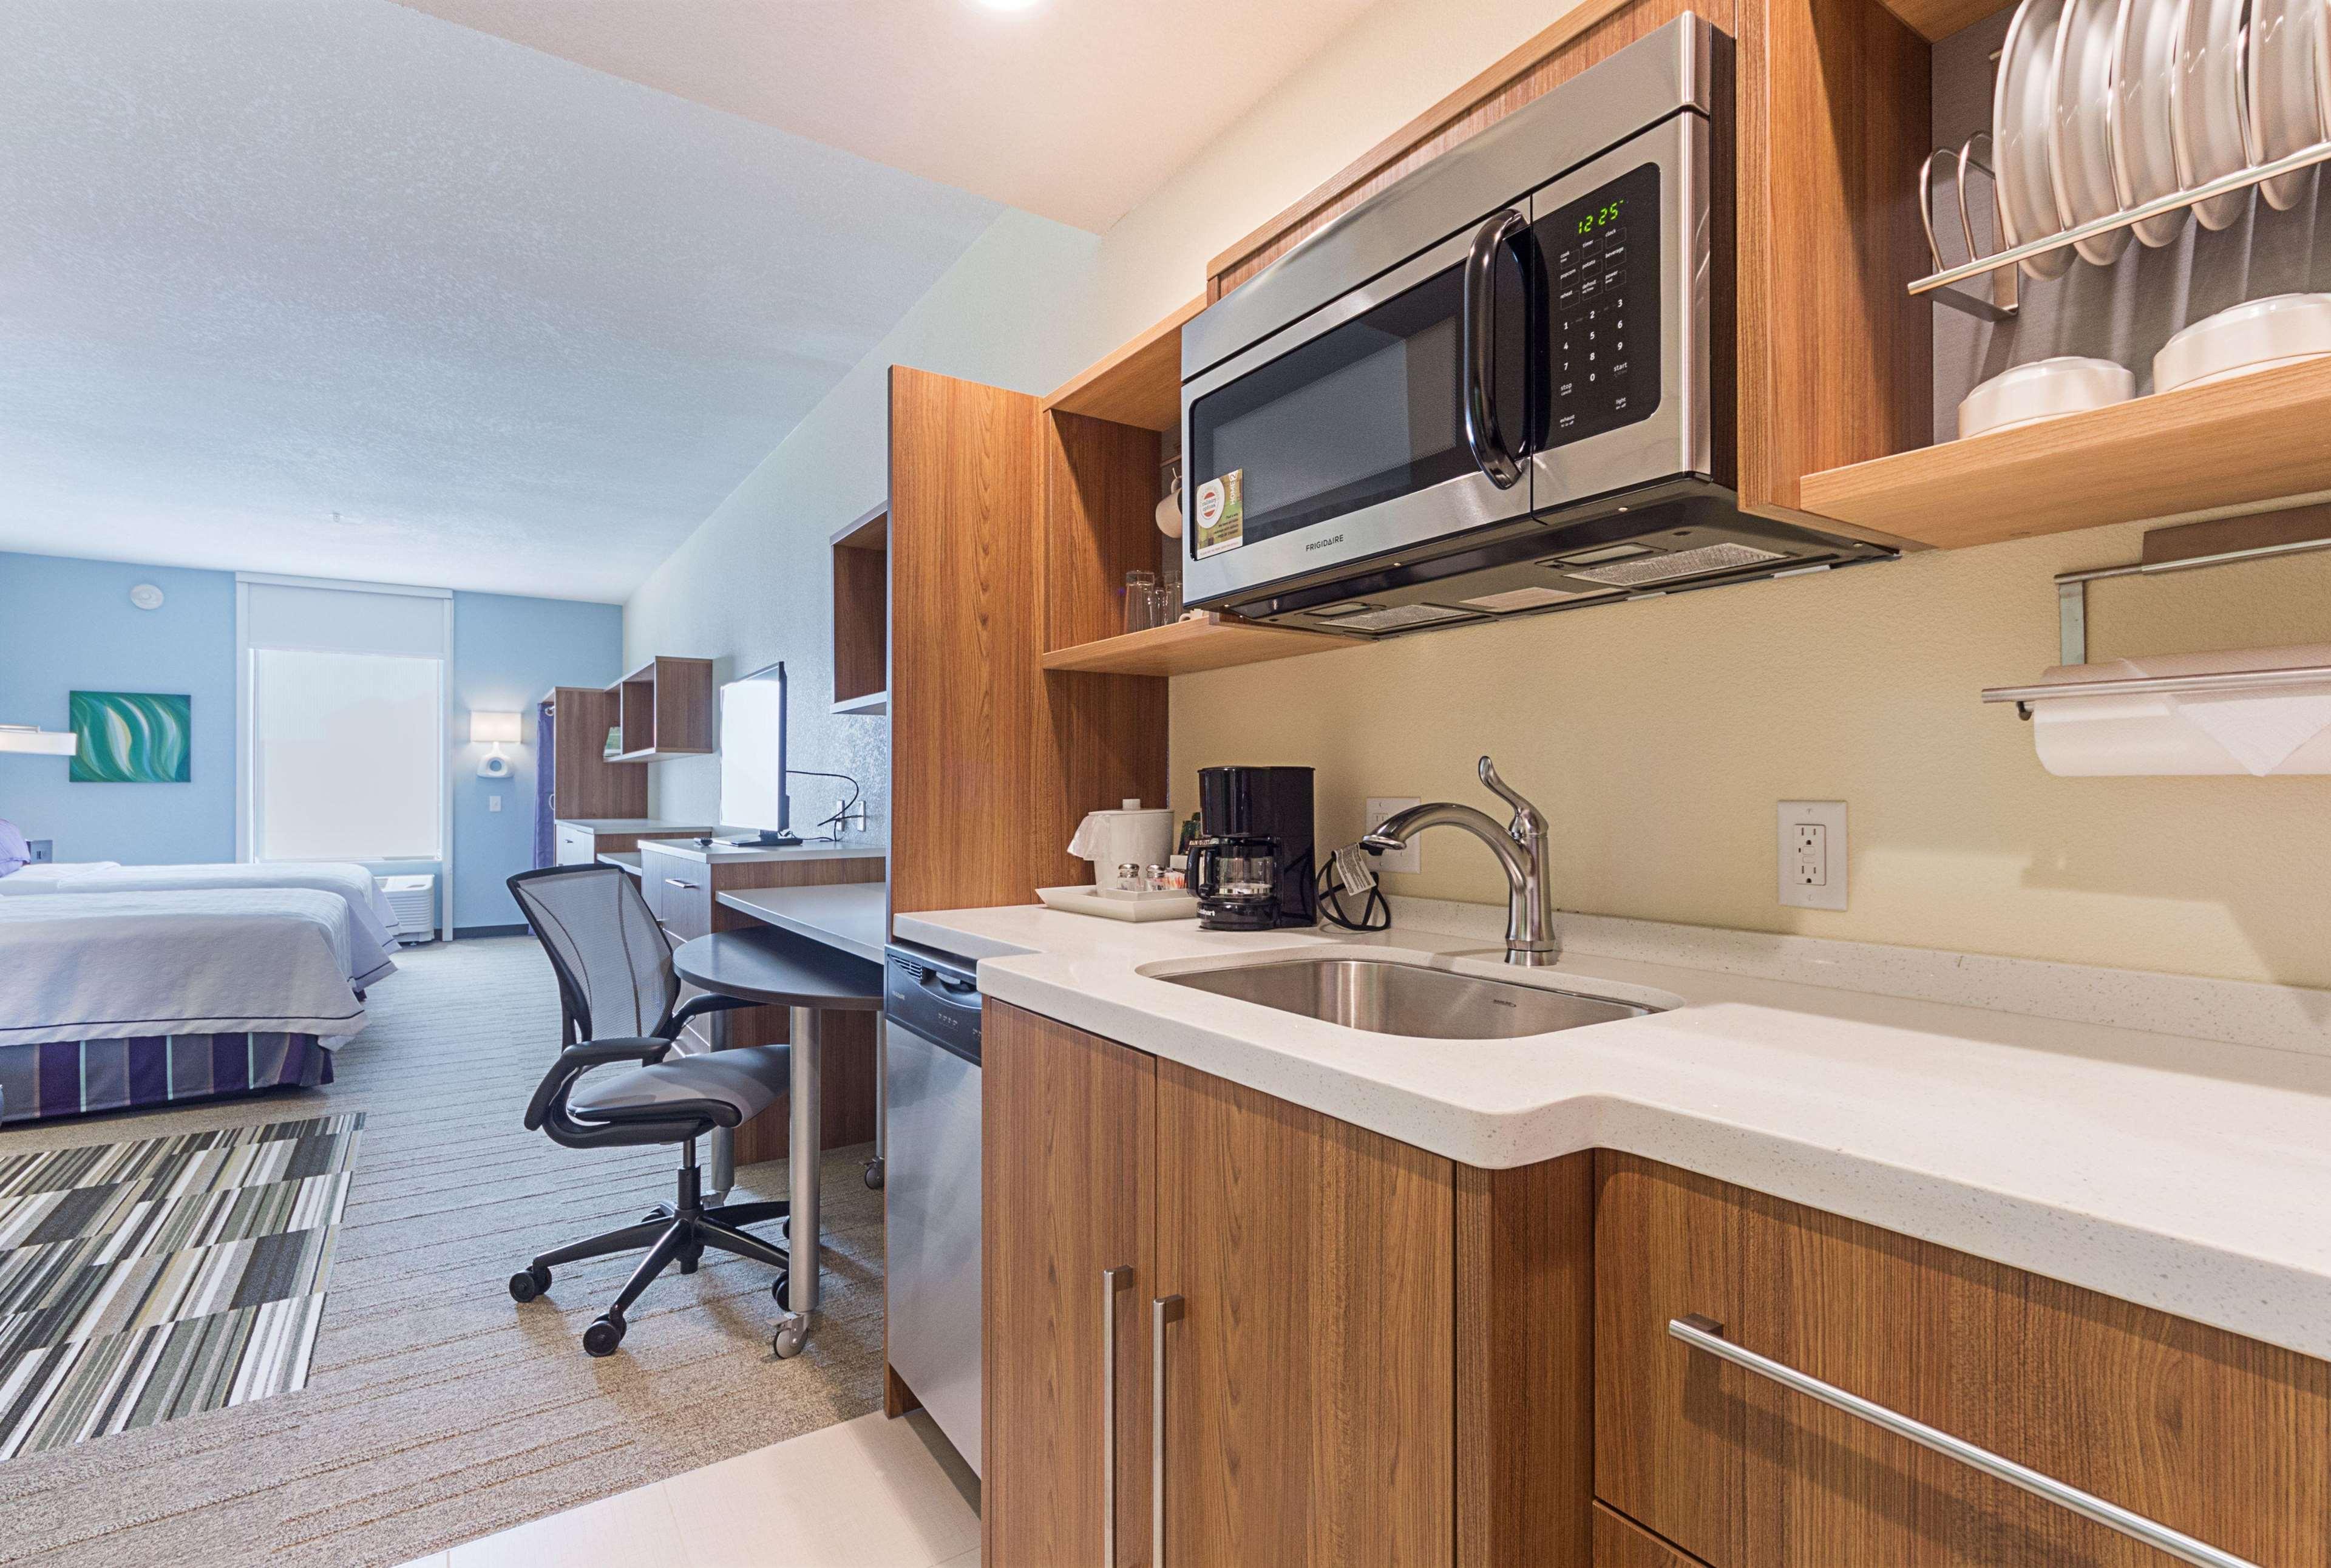 Home 2 Suites by Hilton - Yukon image 35